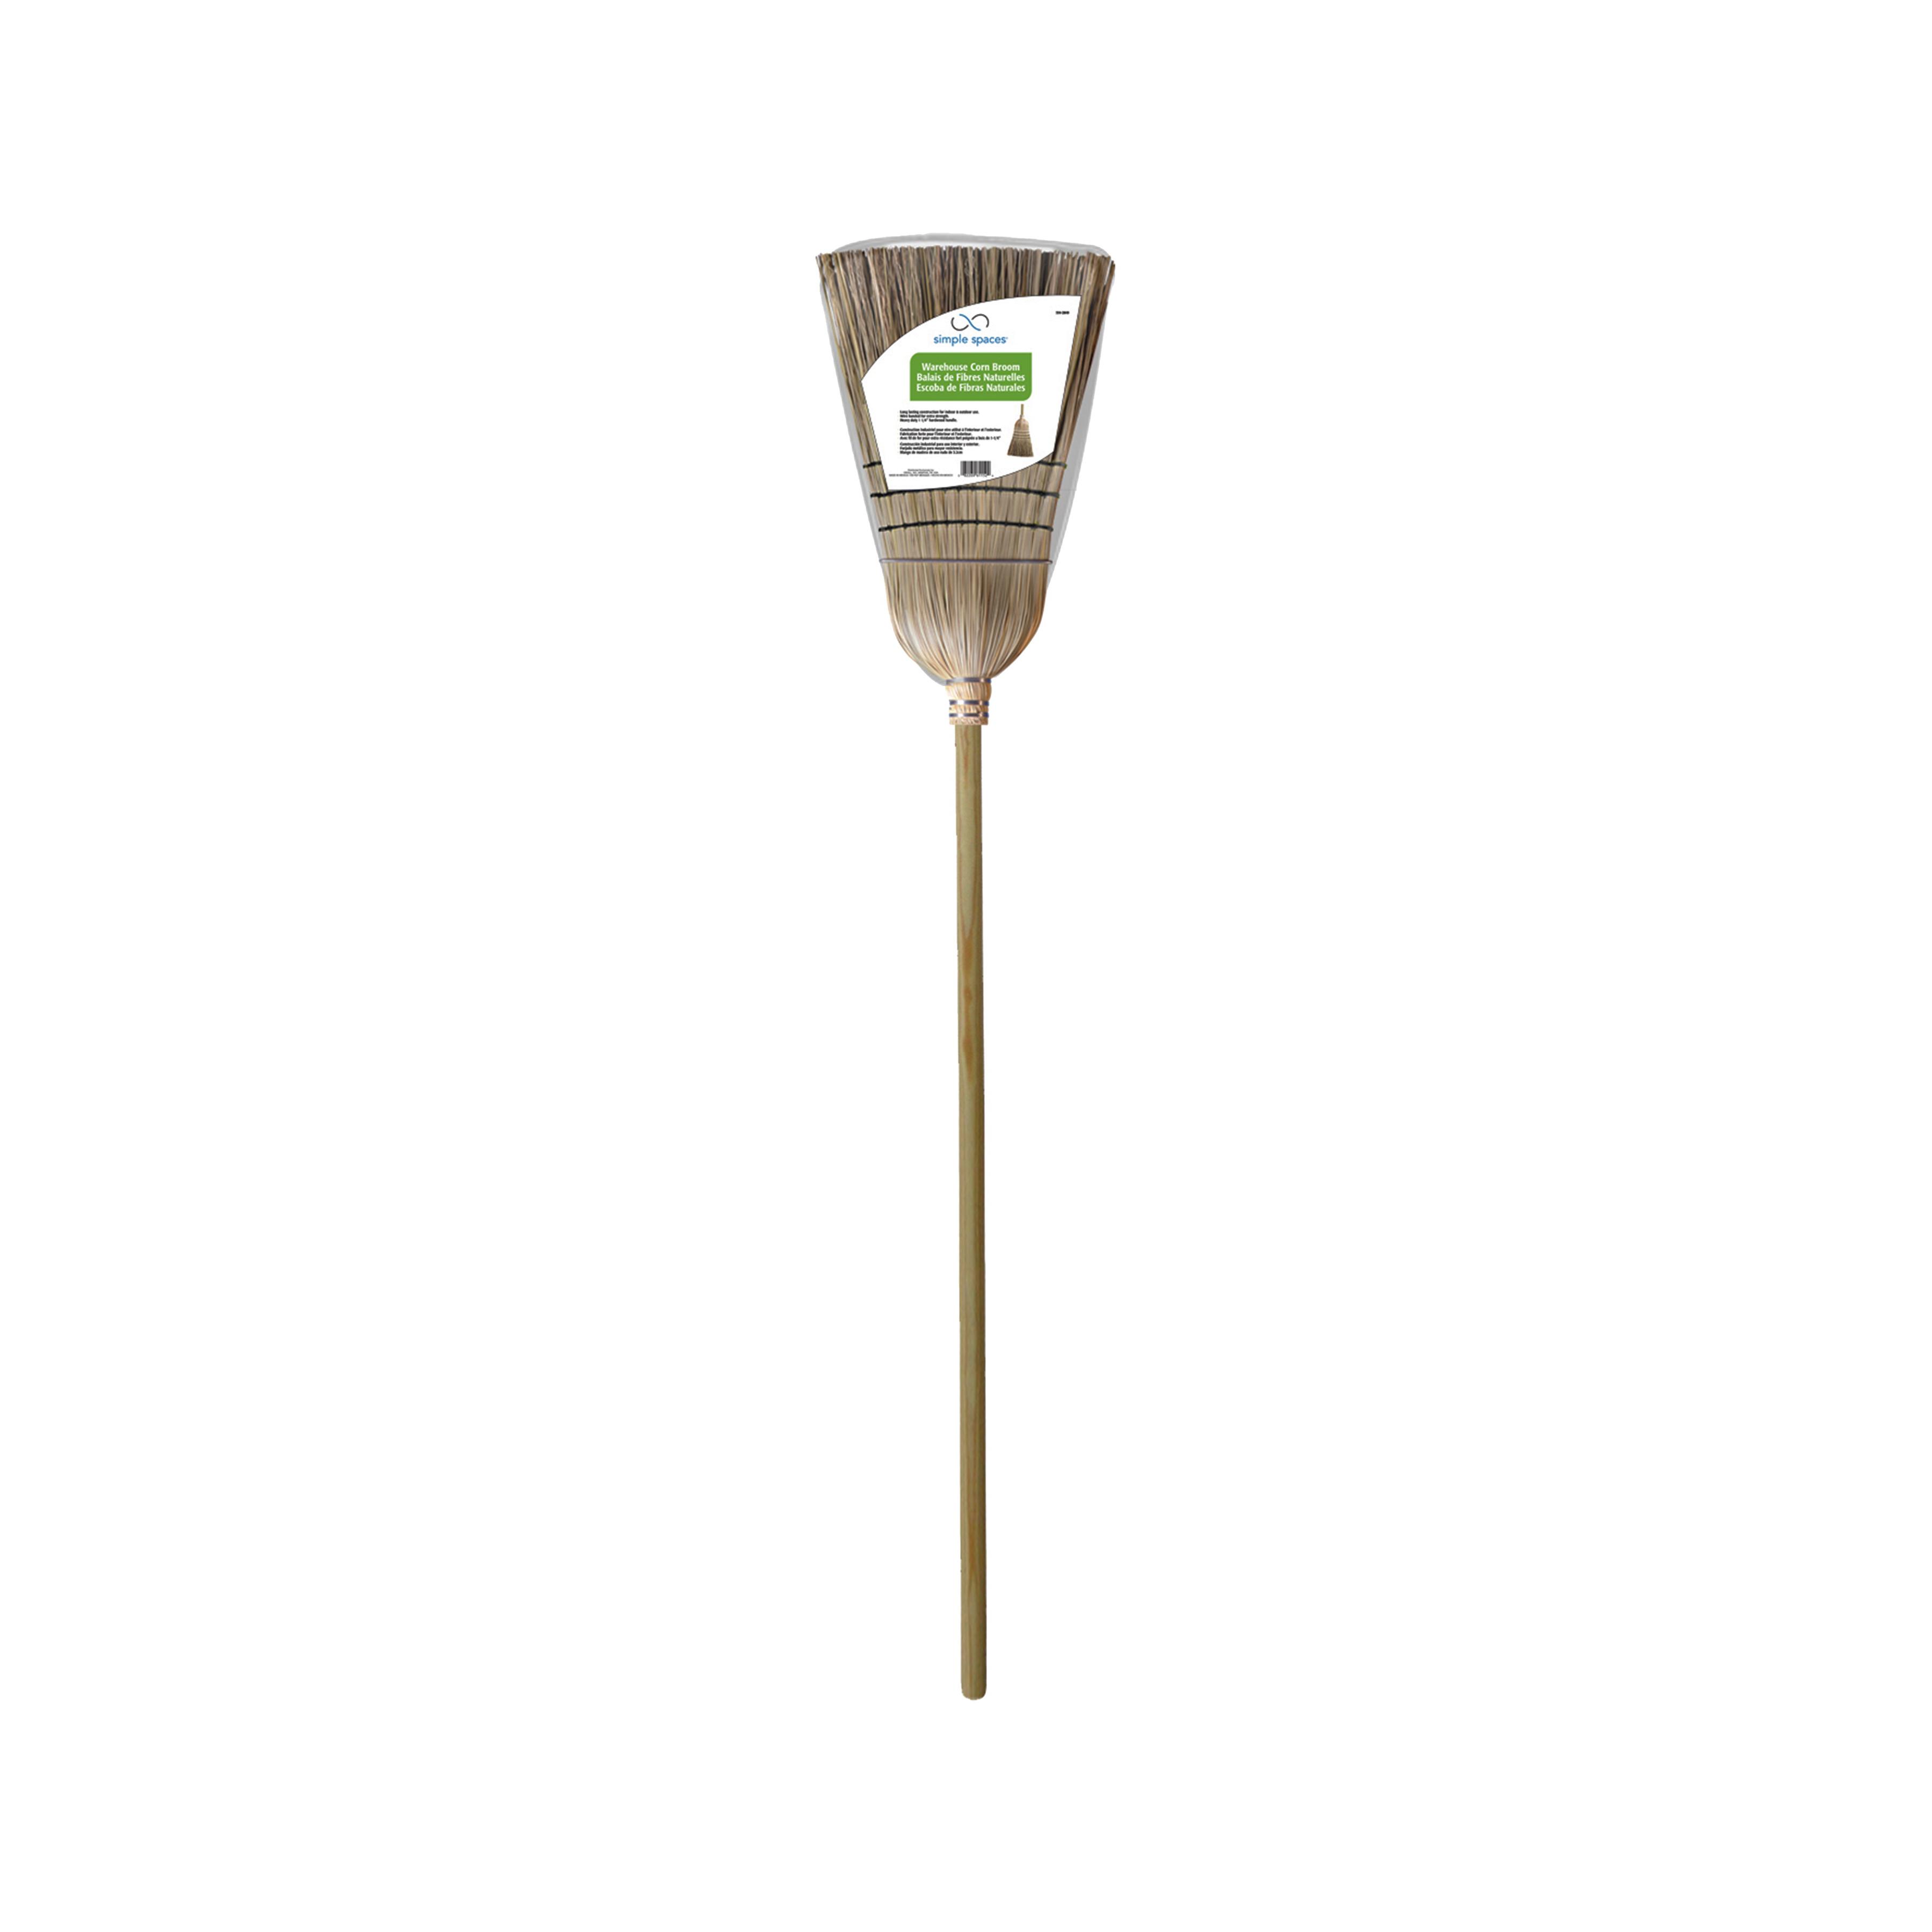 Picture of Simple Spaces 502 Warehouse Broom, Corn Fiber Bristle, Hardwood Handle